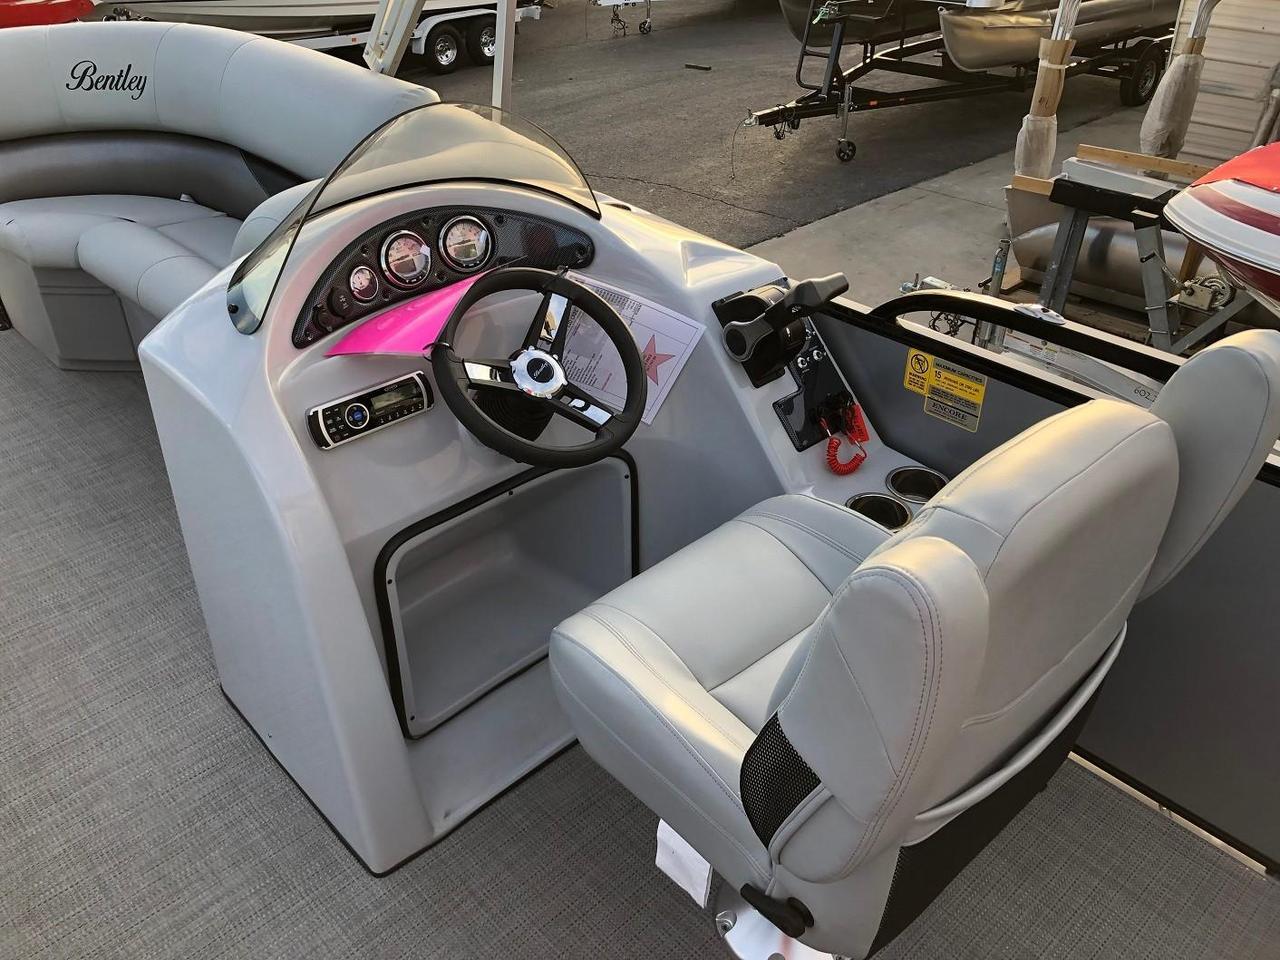 power outboard va boats image manufacturer pontoon sale for pontoons new bentley point provided norfolk